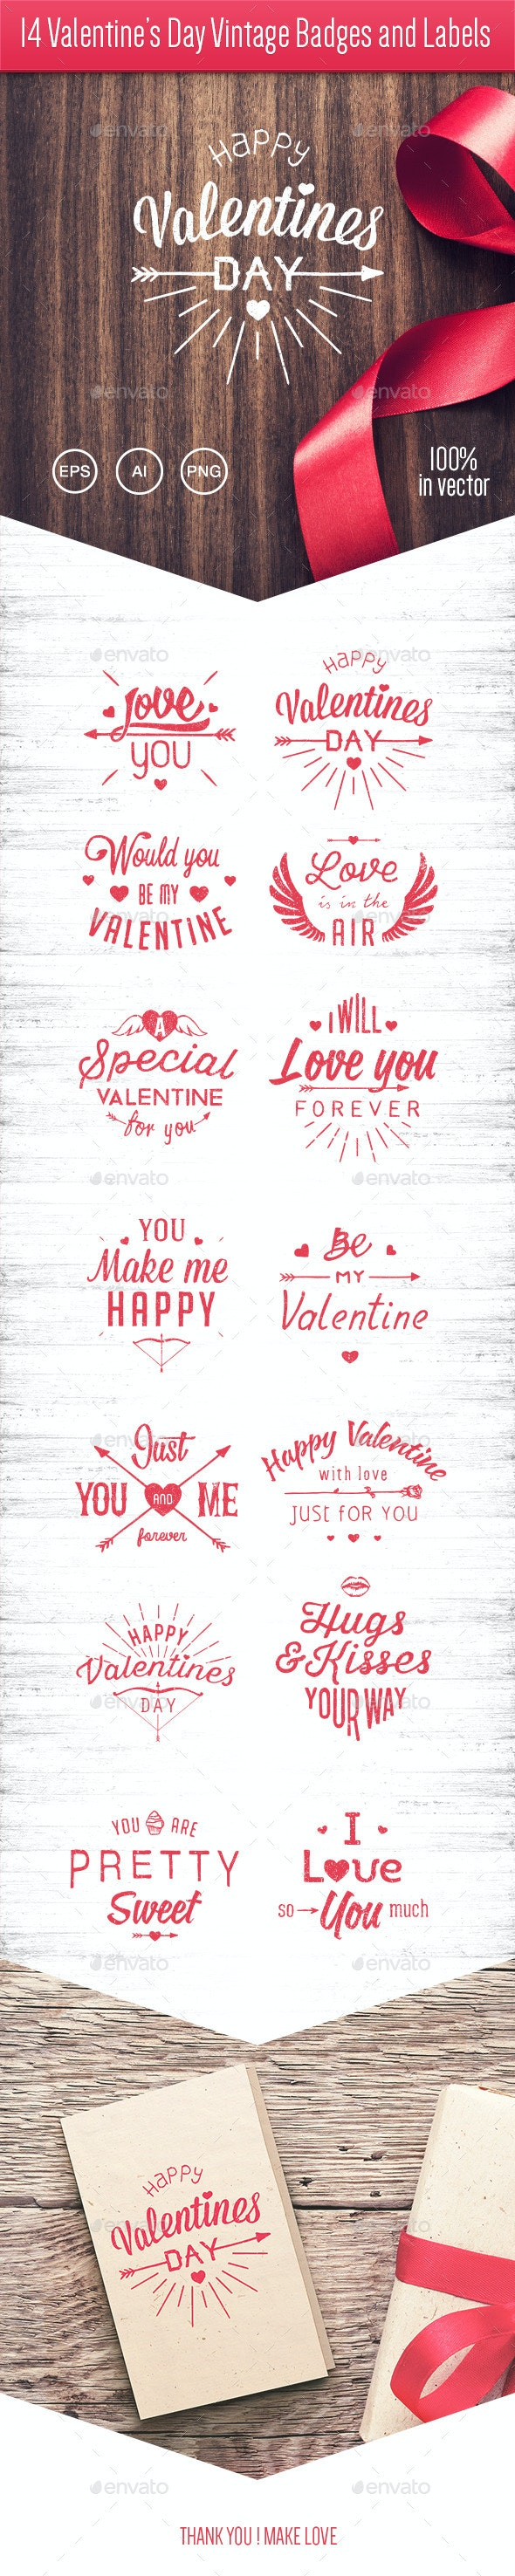 14 Valentine's Day Vintage Badges and Labels - Valentines Seasons/Holidays